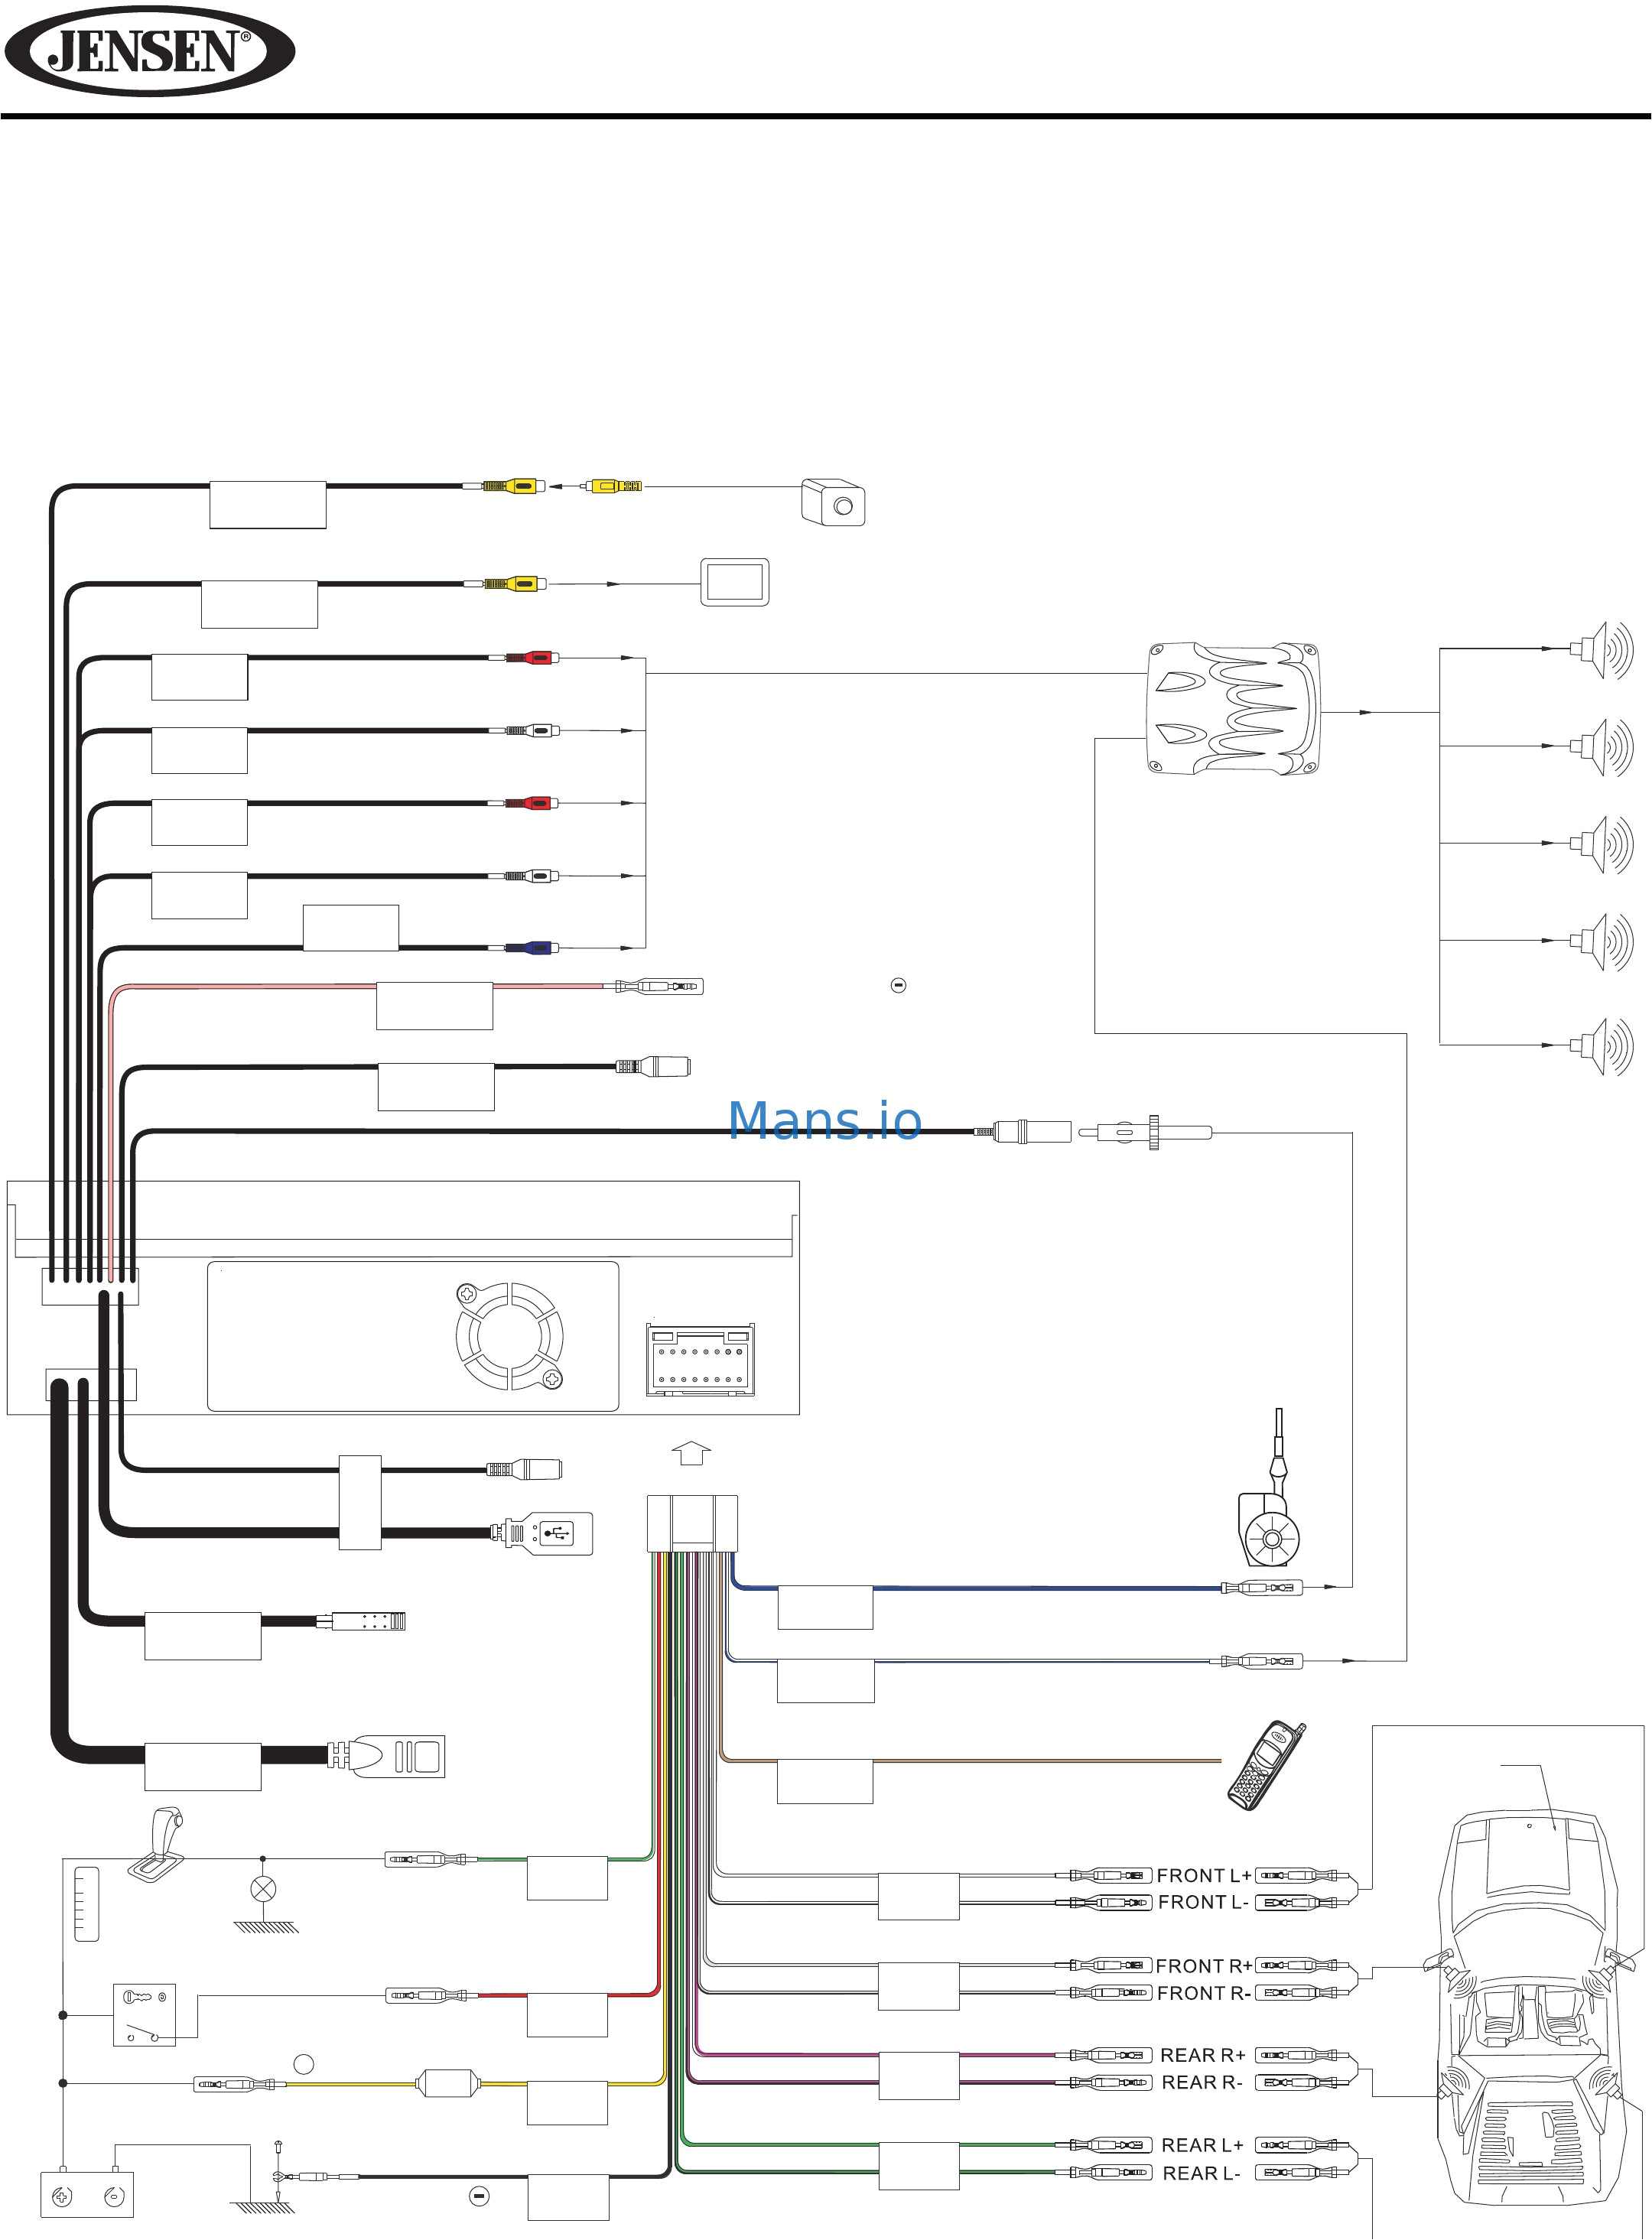 jensen vm9510 wiring harness diagram wiring diagram files jensen radio model vm9510 wiring diagram